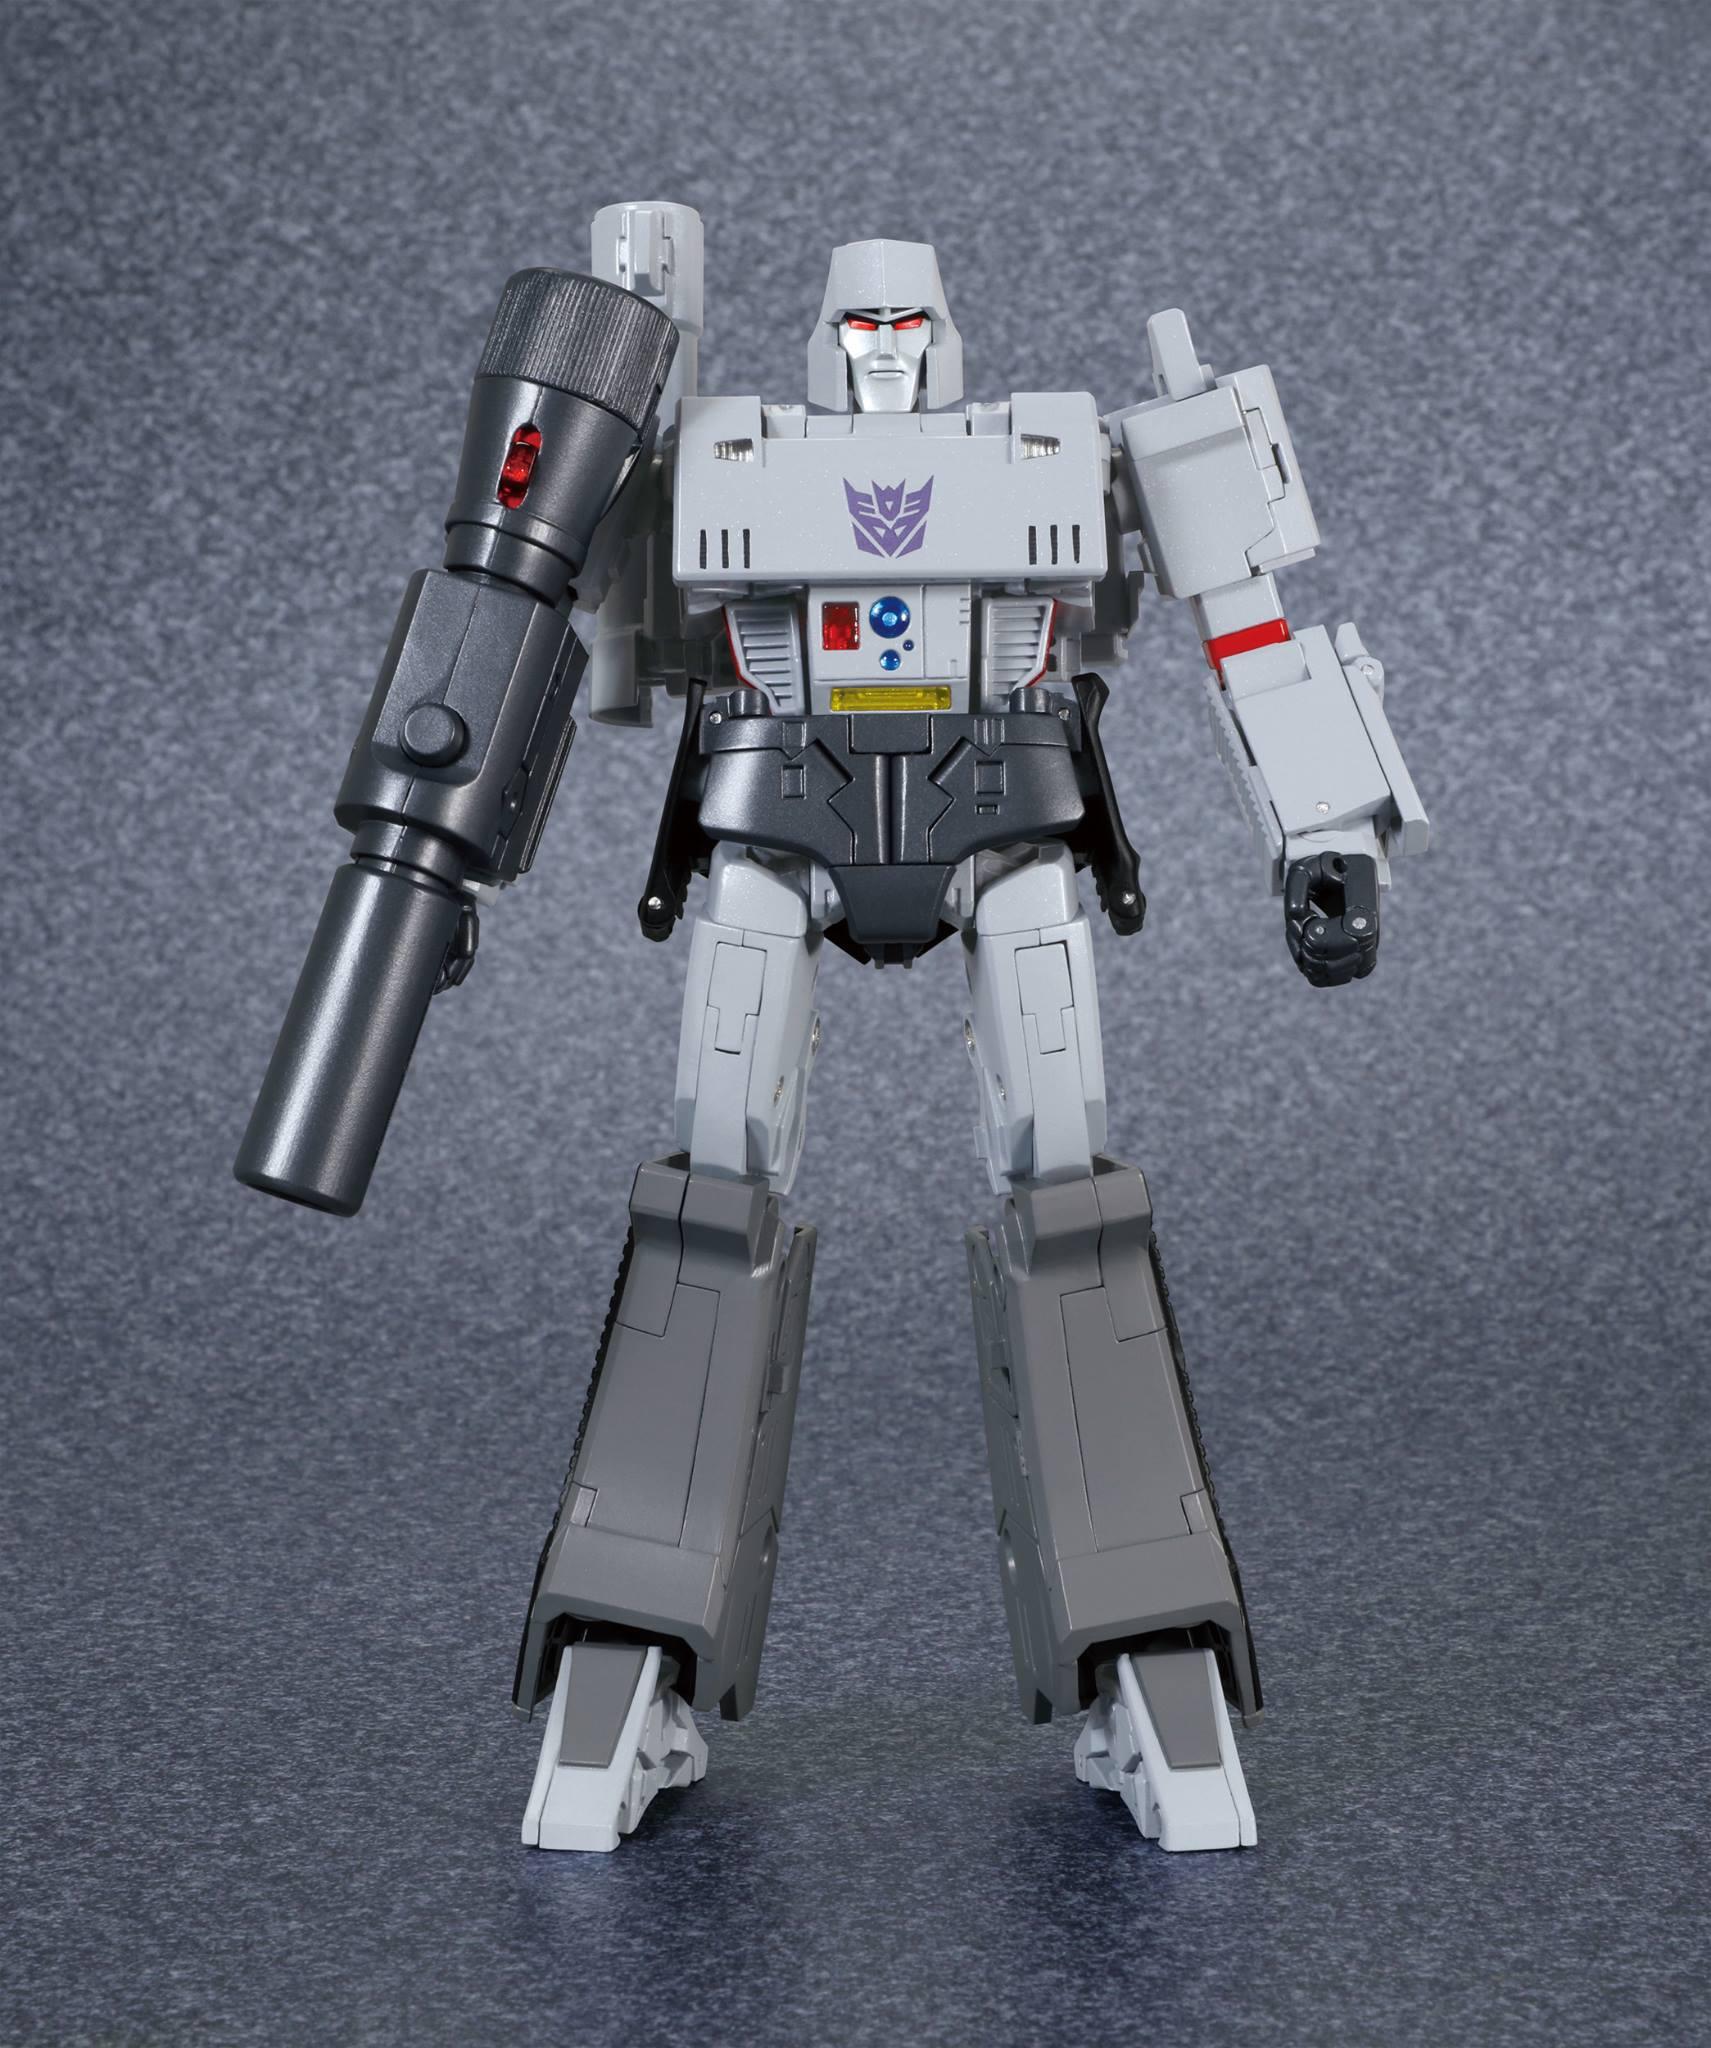 Megatron (MP-36) - Transformers Toys - TFW2005